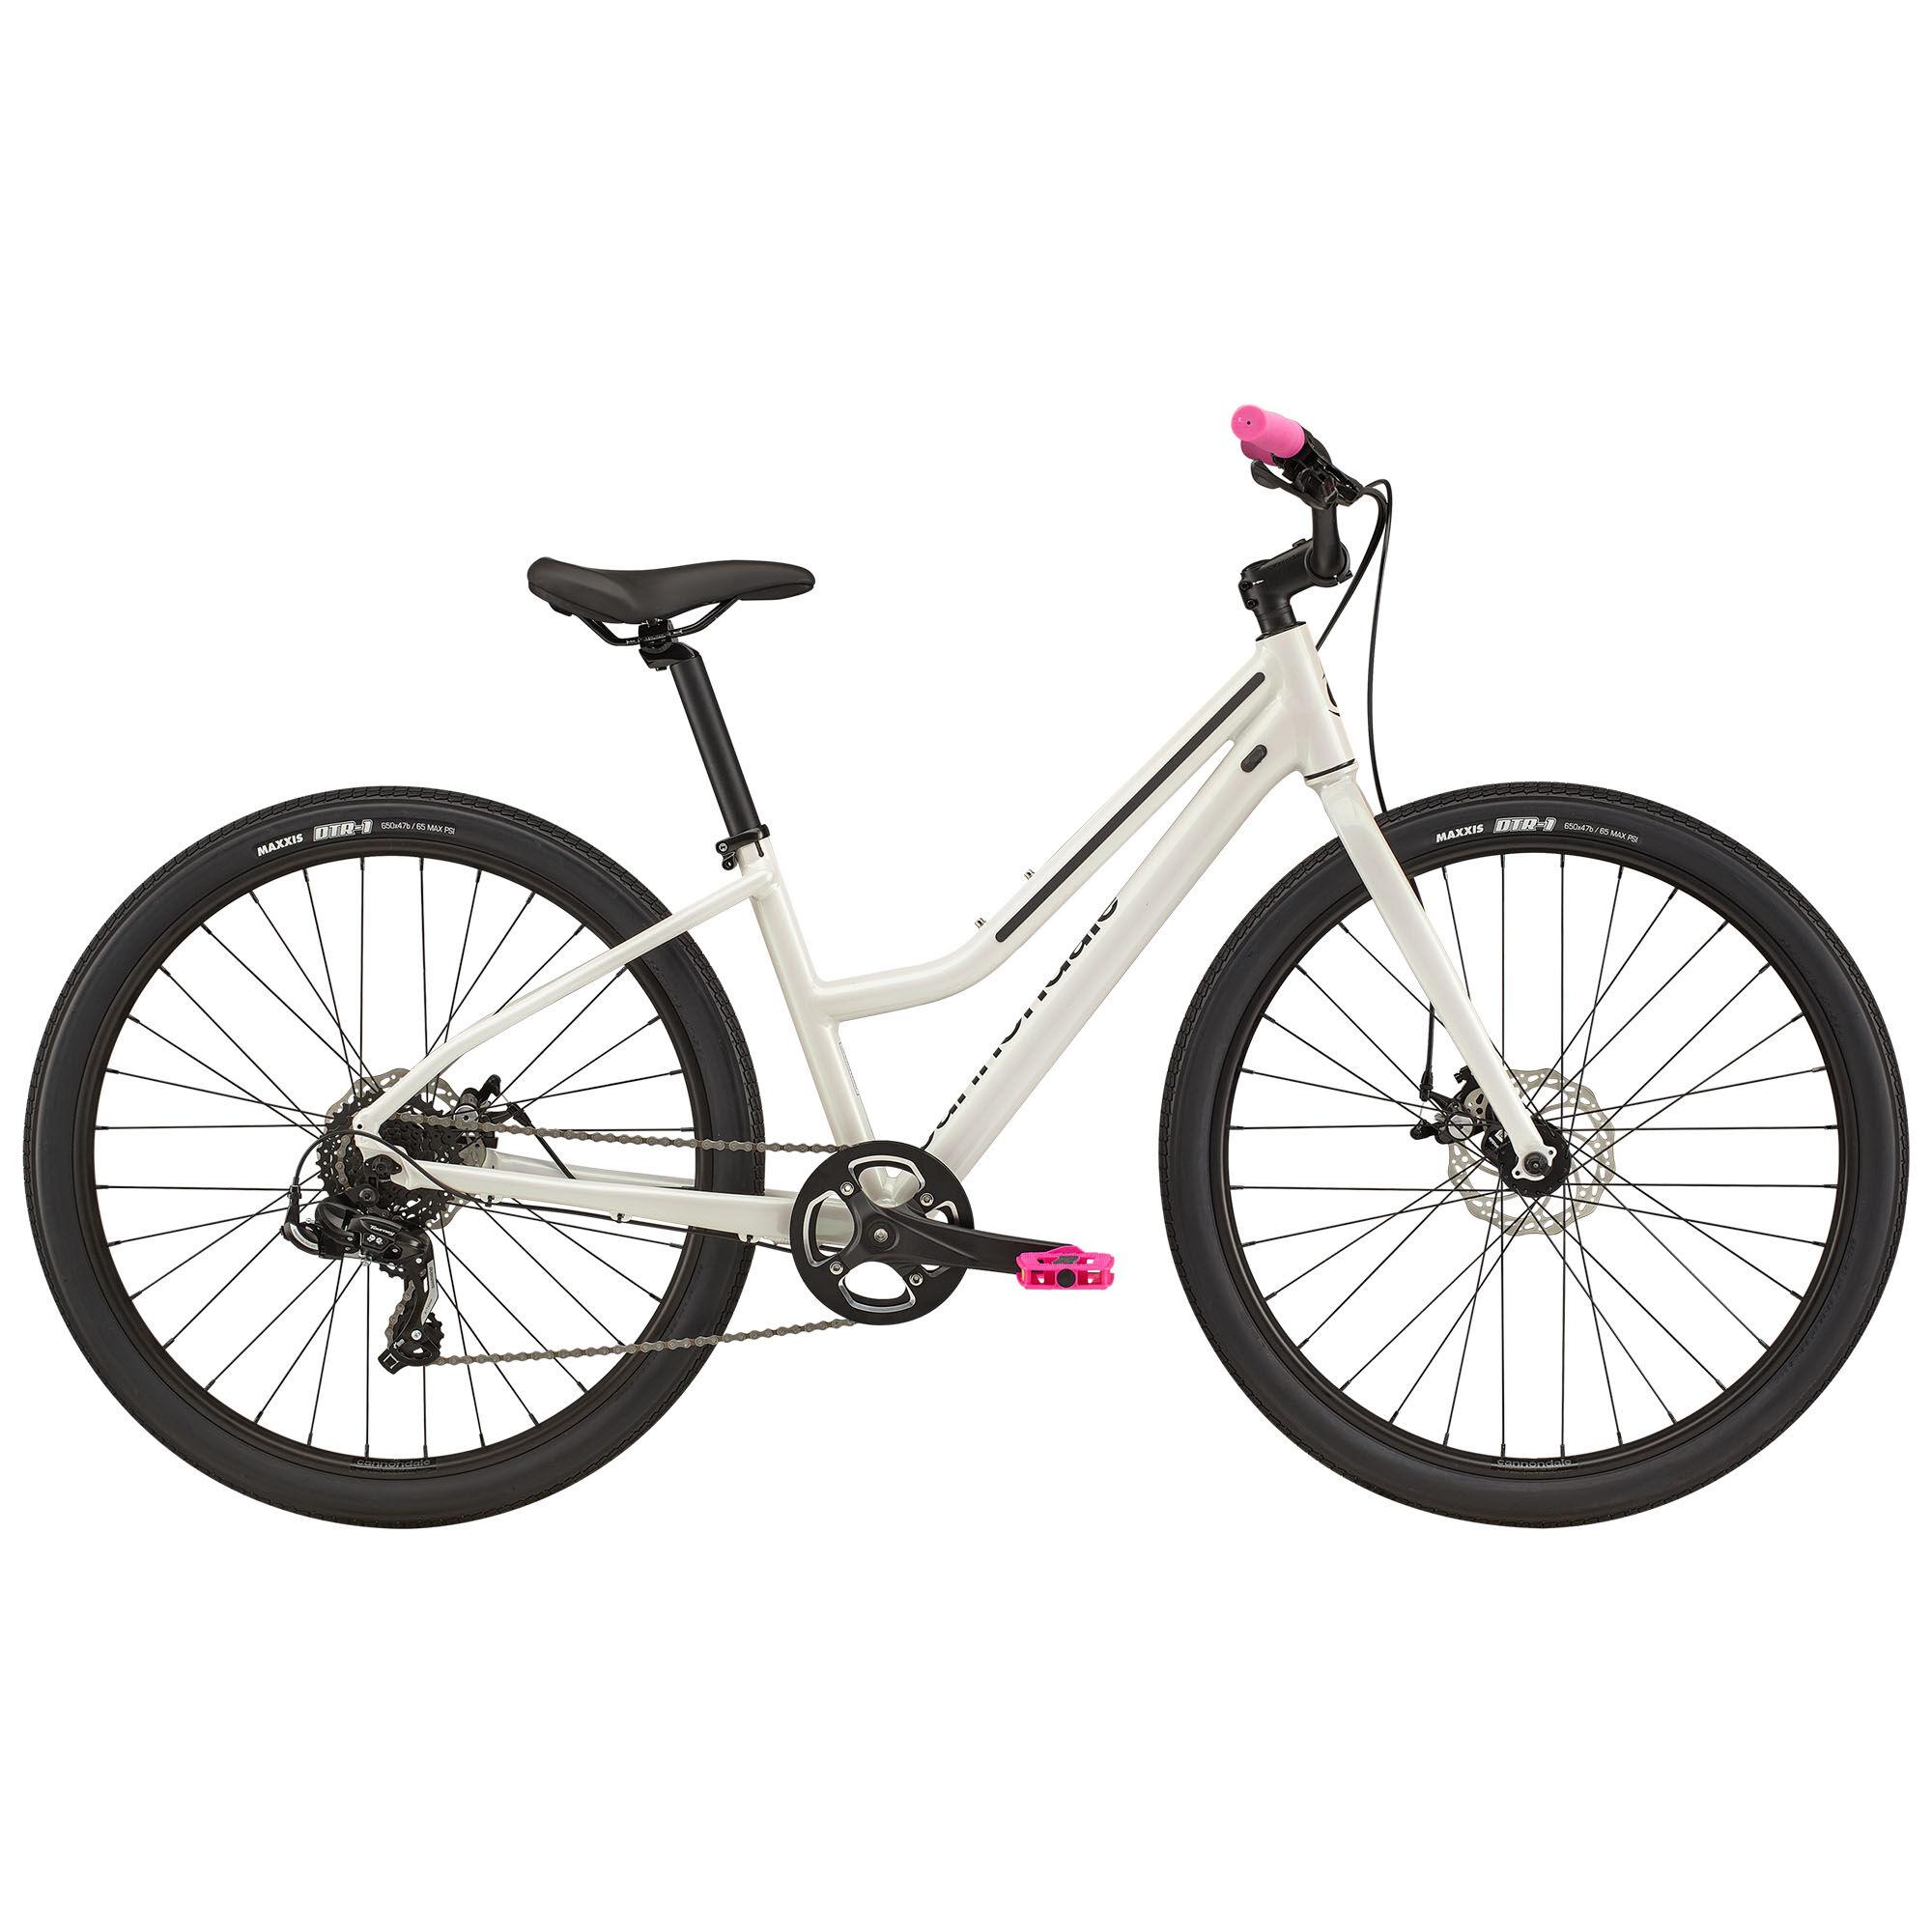 Cannondale Treadwell 3 Remixte Urban Bike '21  - Iridescent - Size: Large